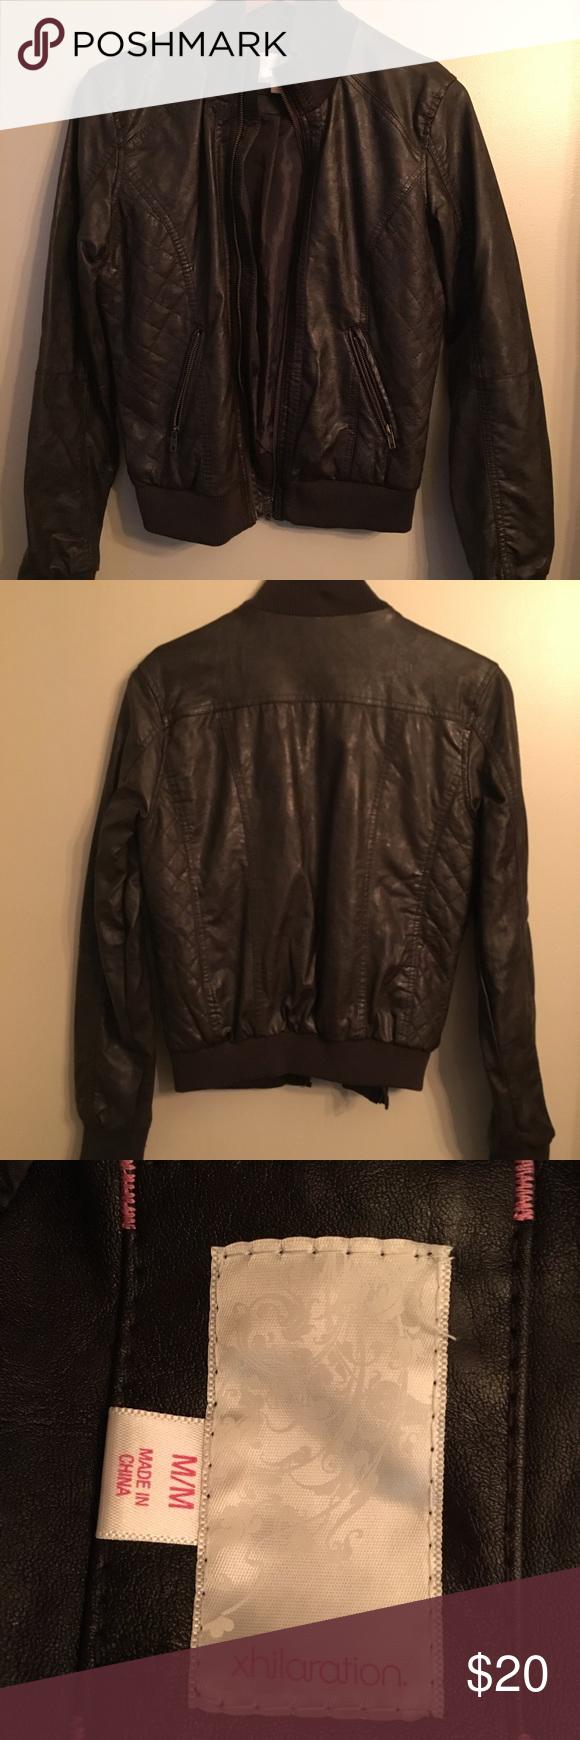 Nwot Target Xhilaration Vegan Leather Jacket Vegan Leather Jacket Leather Jacket Clothes Design [ png ]